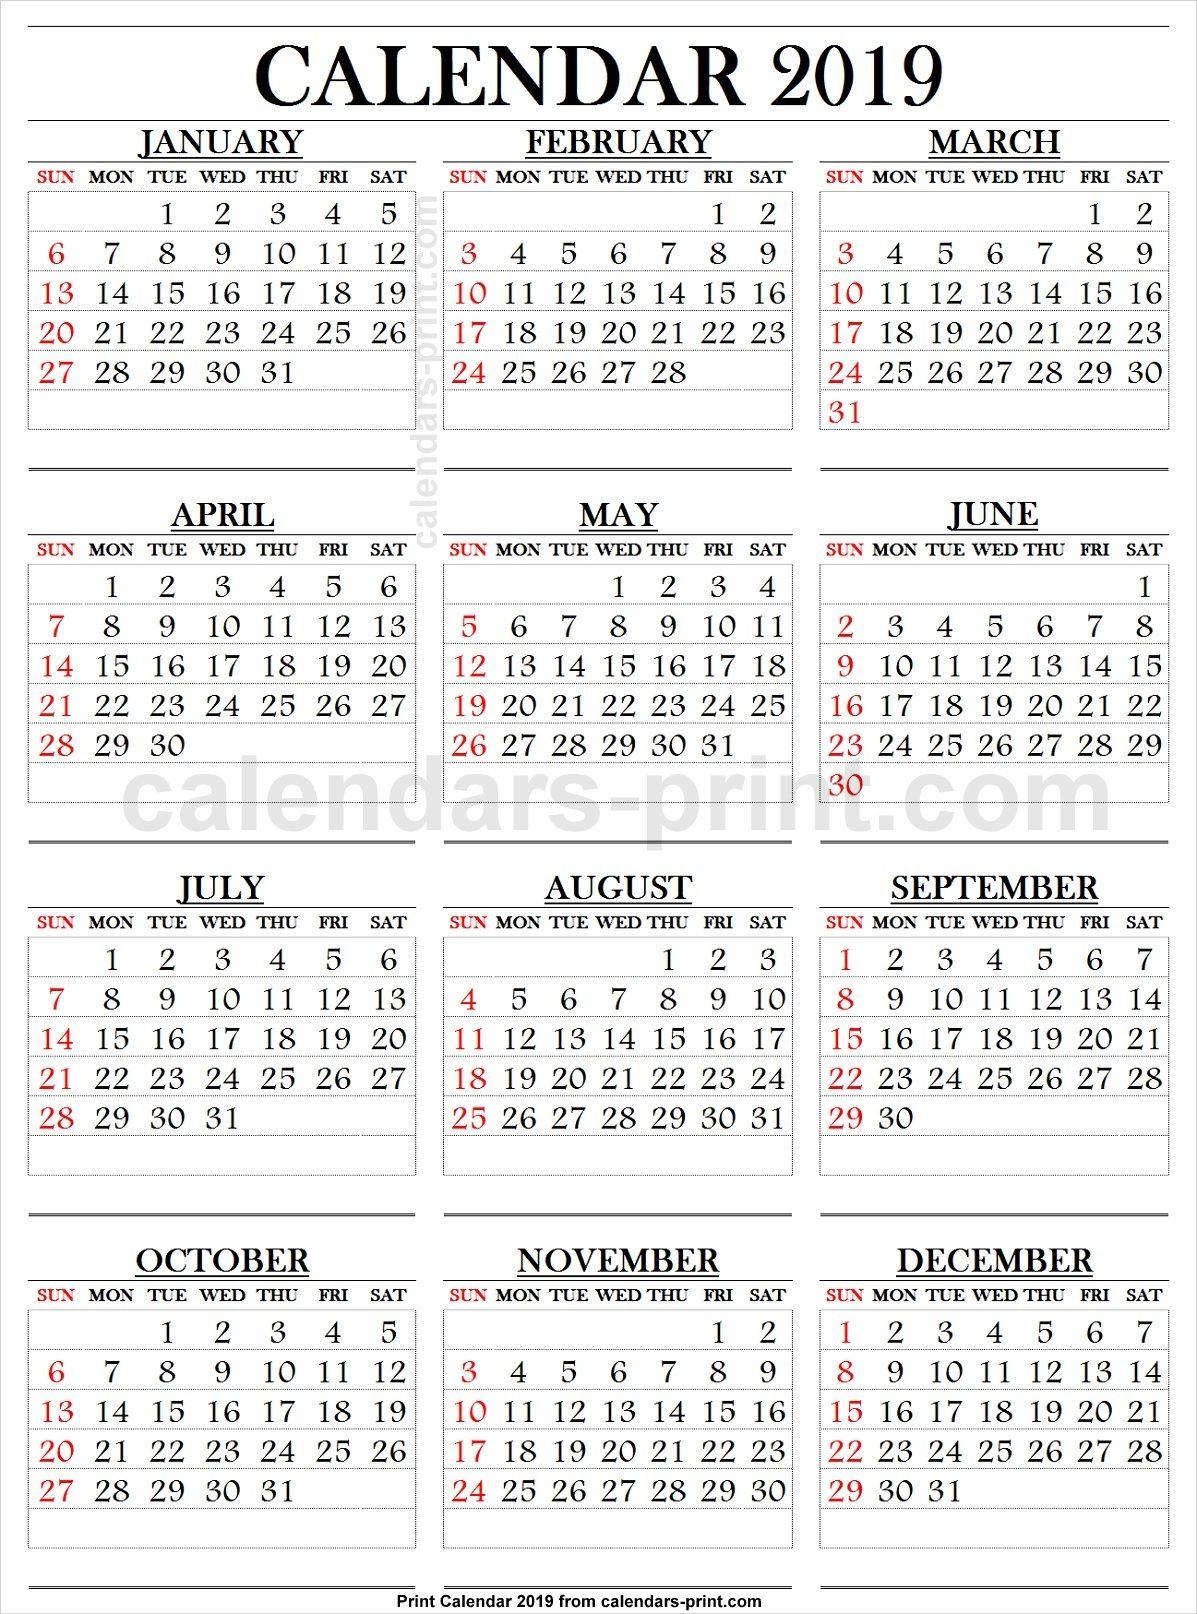 2019 Calendar Large Numbers | 2019 Calendar, Calendar 2019